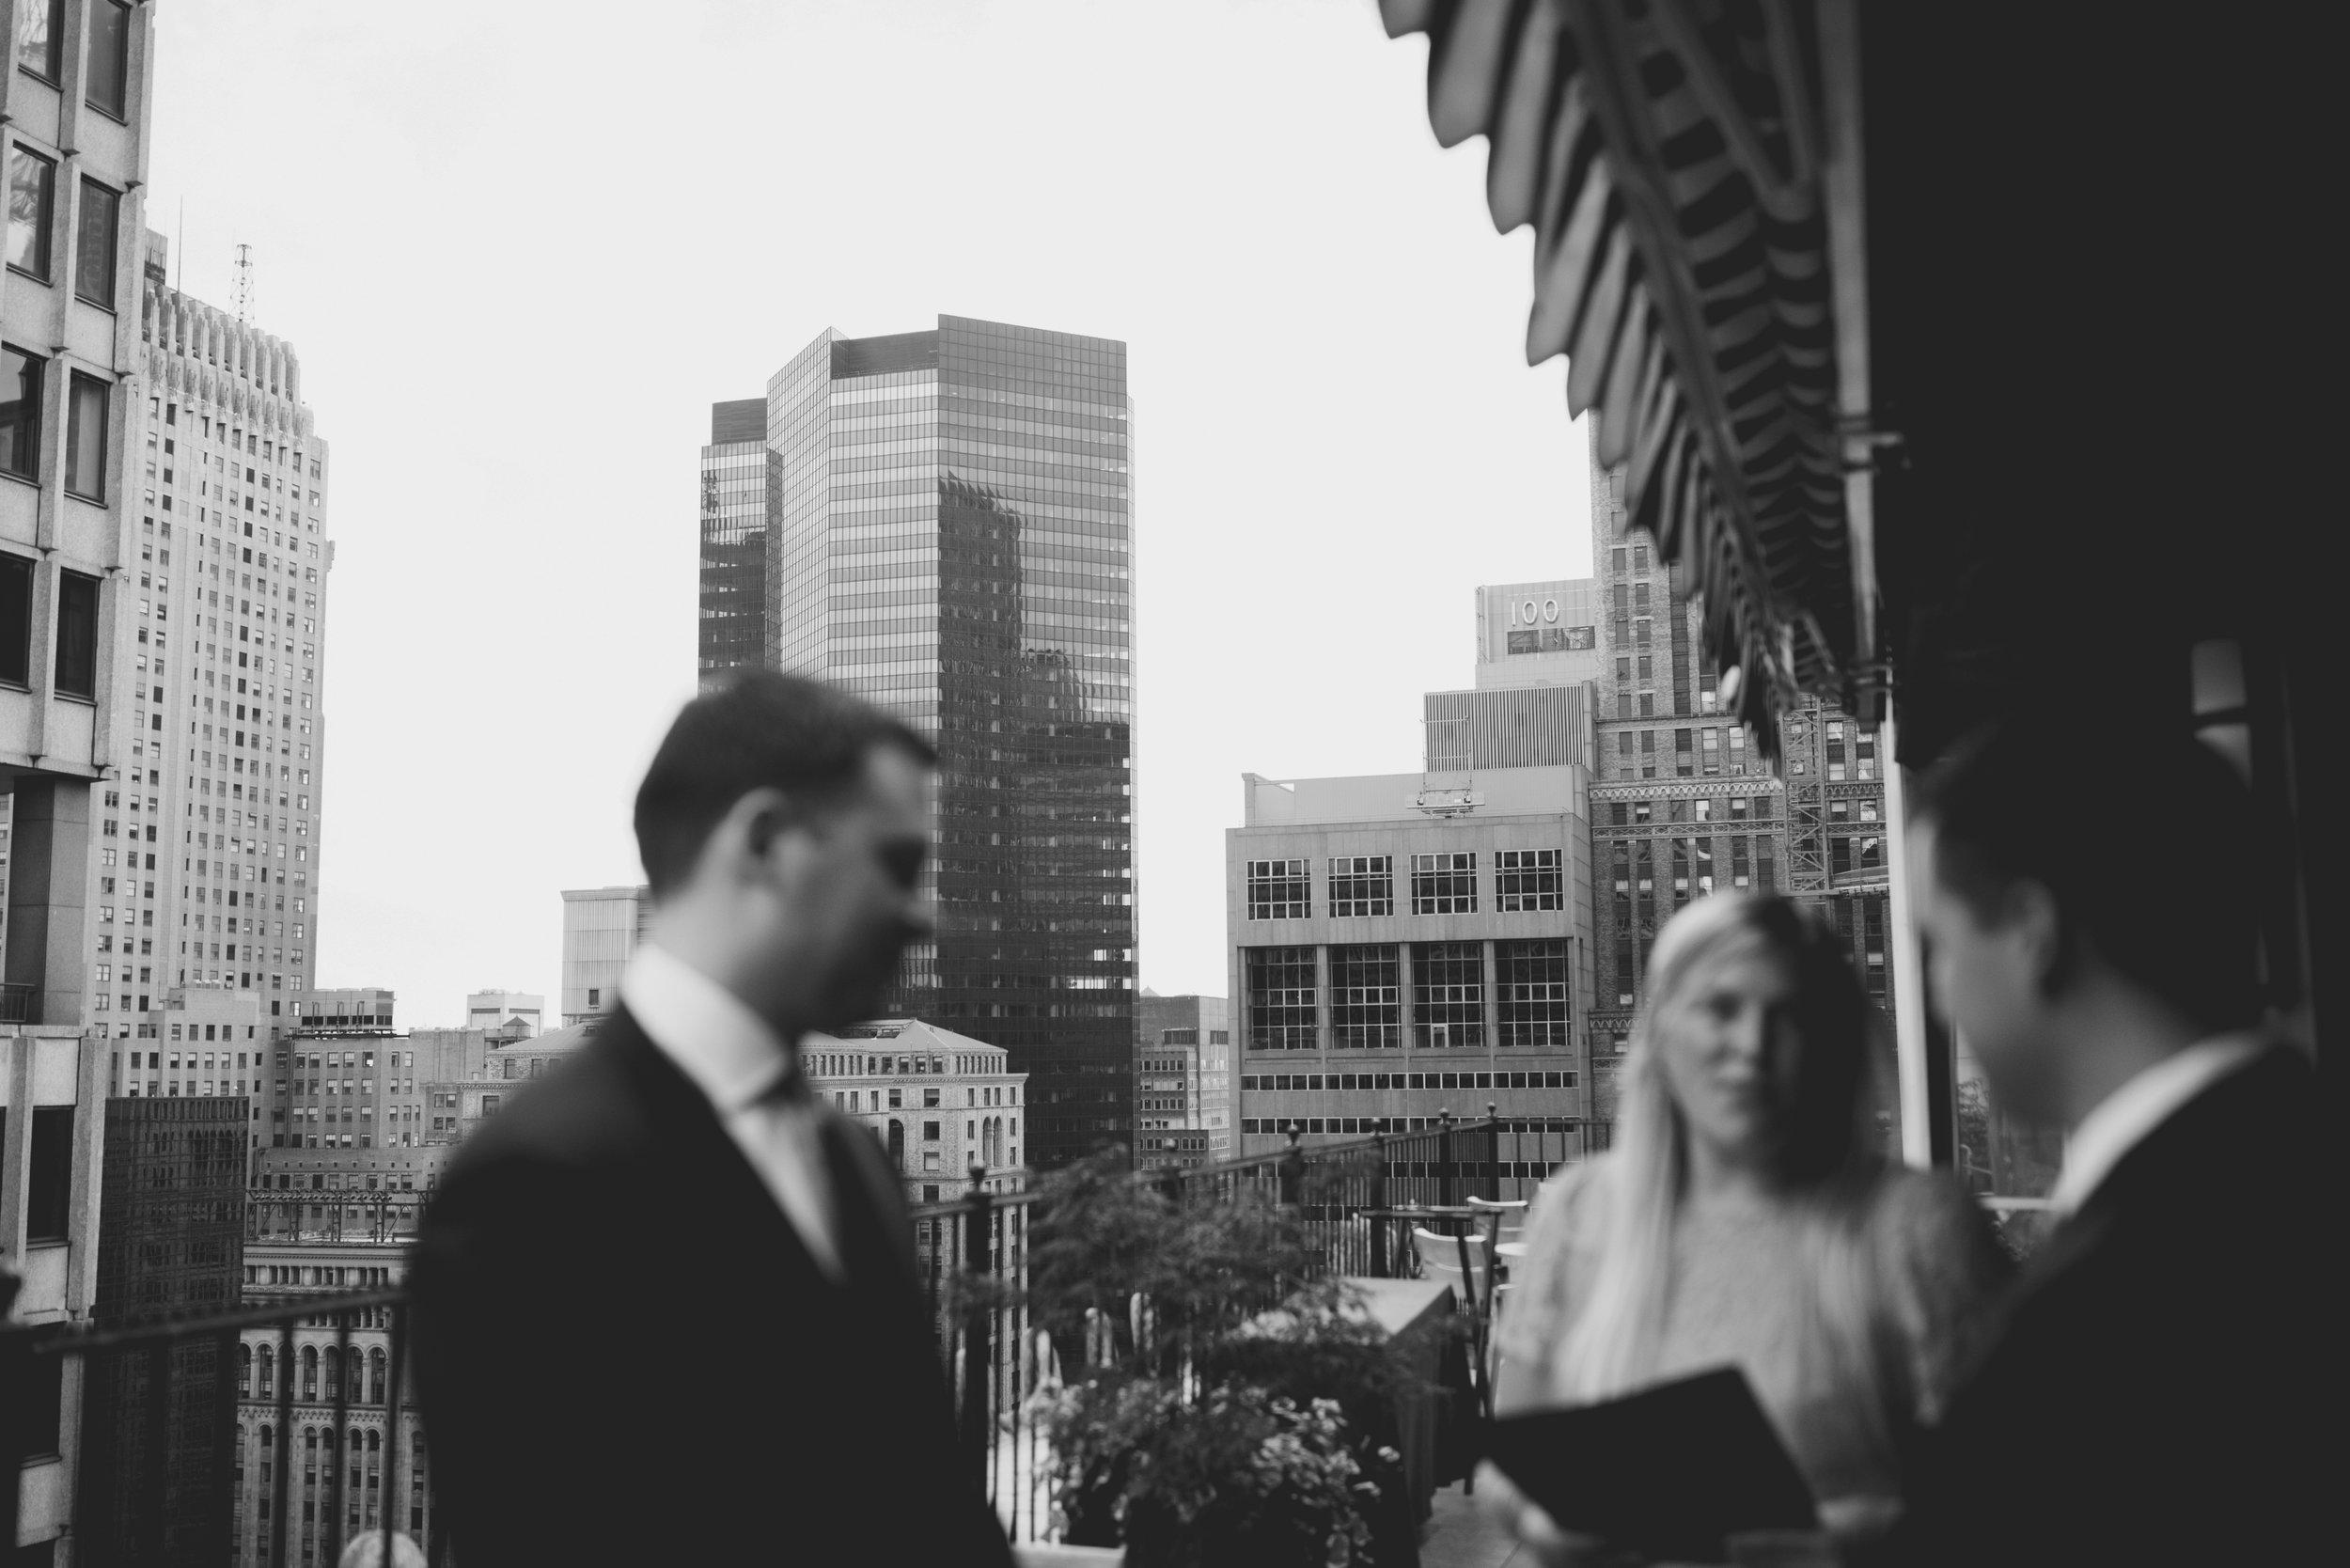 amanda_vanvels_new_york_lgbtq_gay_wedding_007.jpg